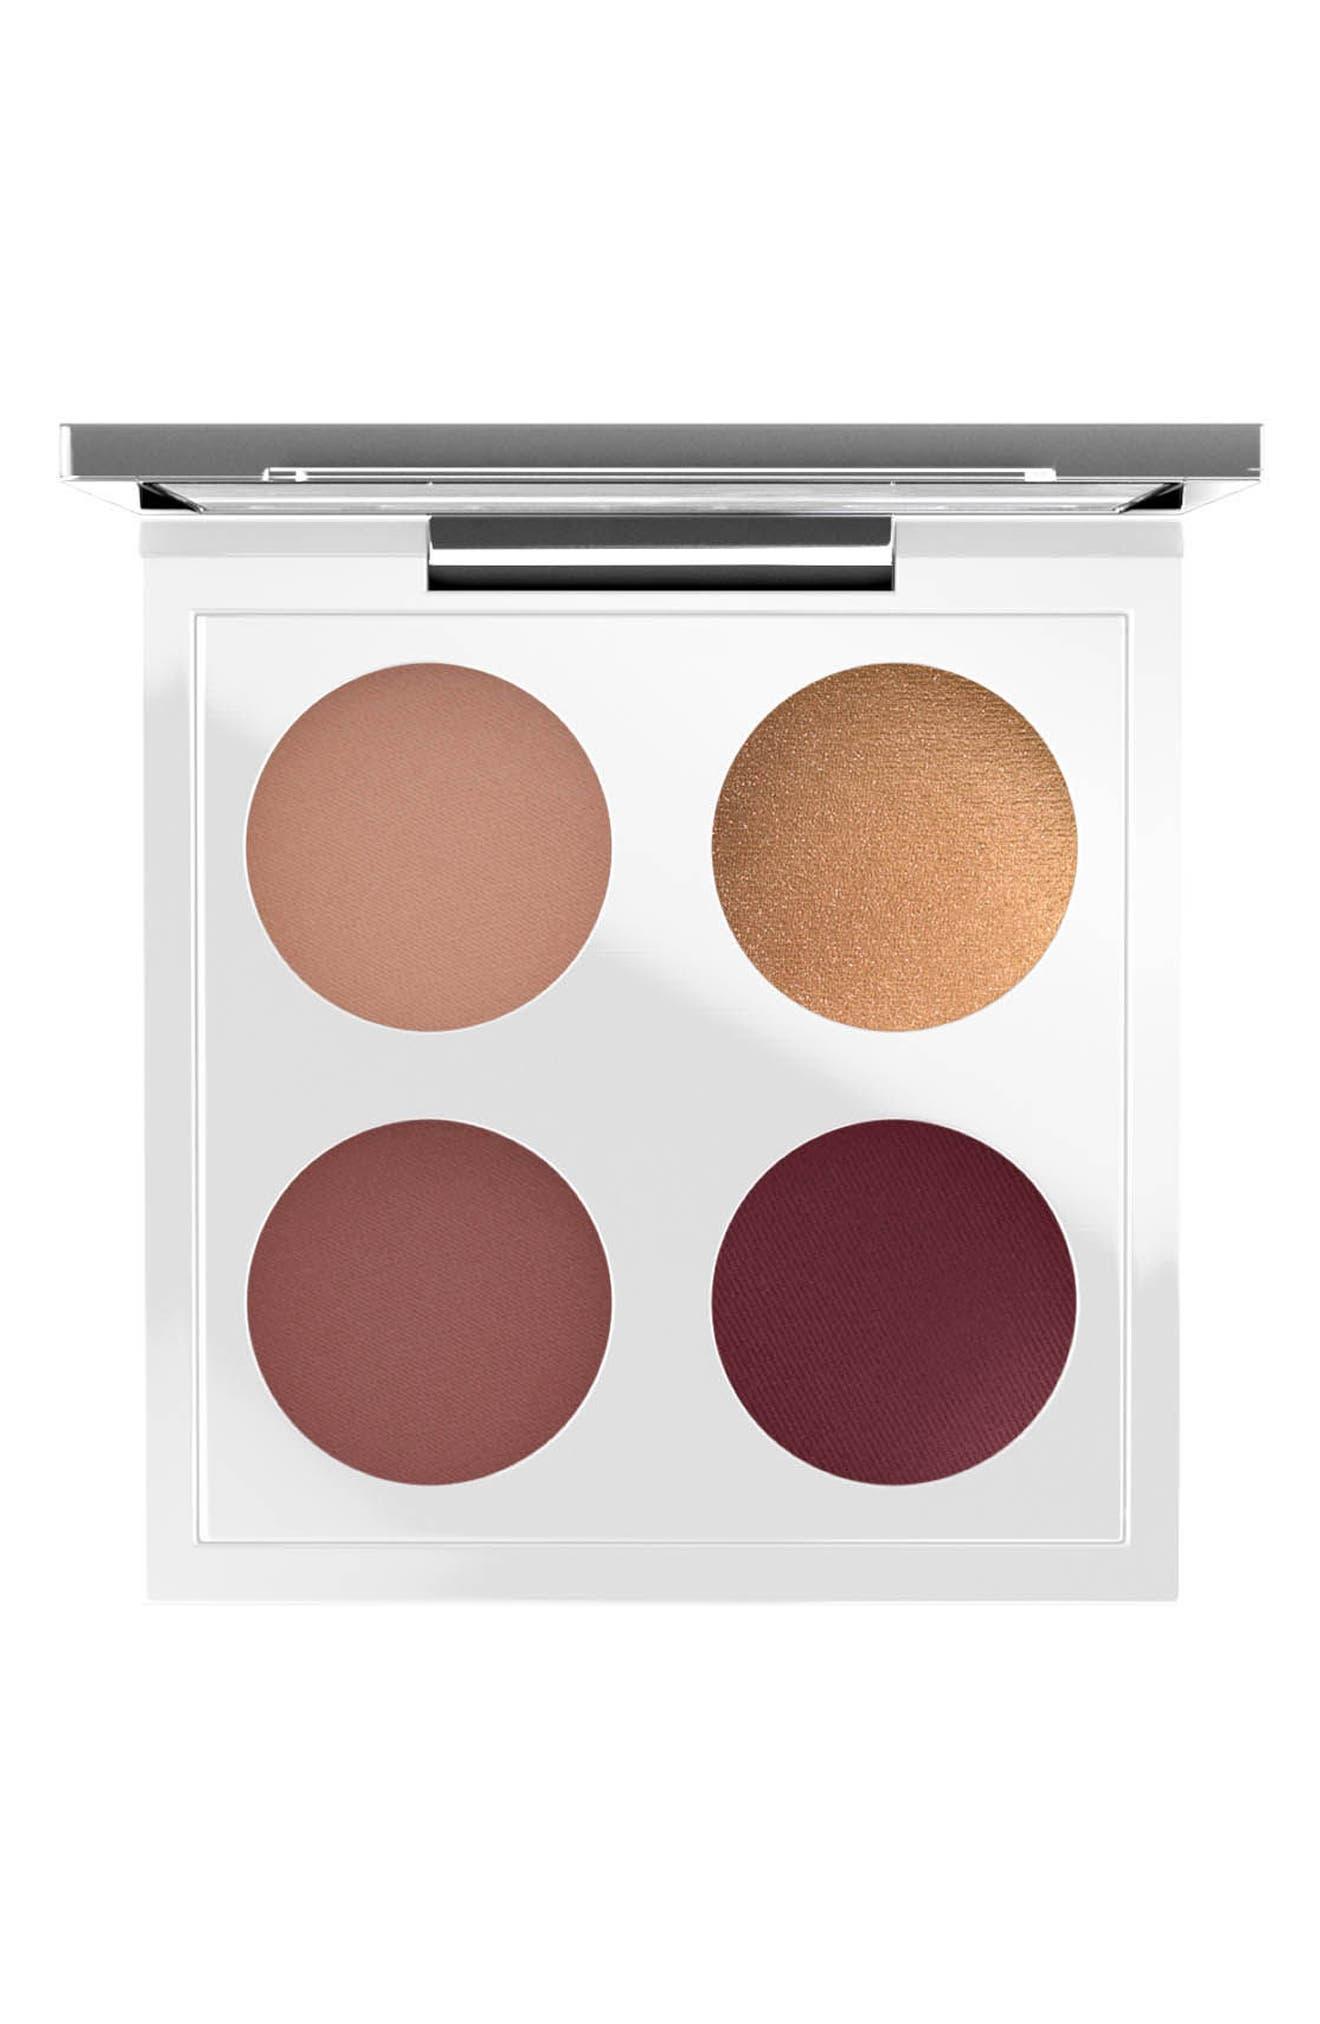 MAC x Patrickstarrr Eyeshadow Palette,                             Main thumbnail 1, color,                             Patrickstarrr Goalgetter